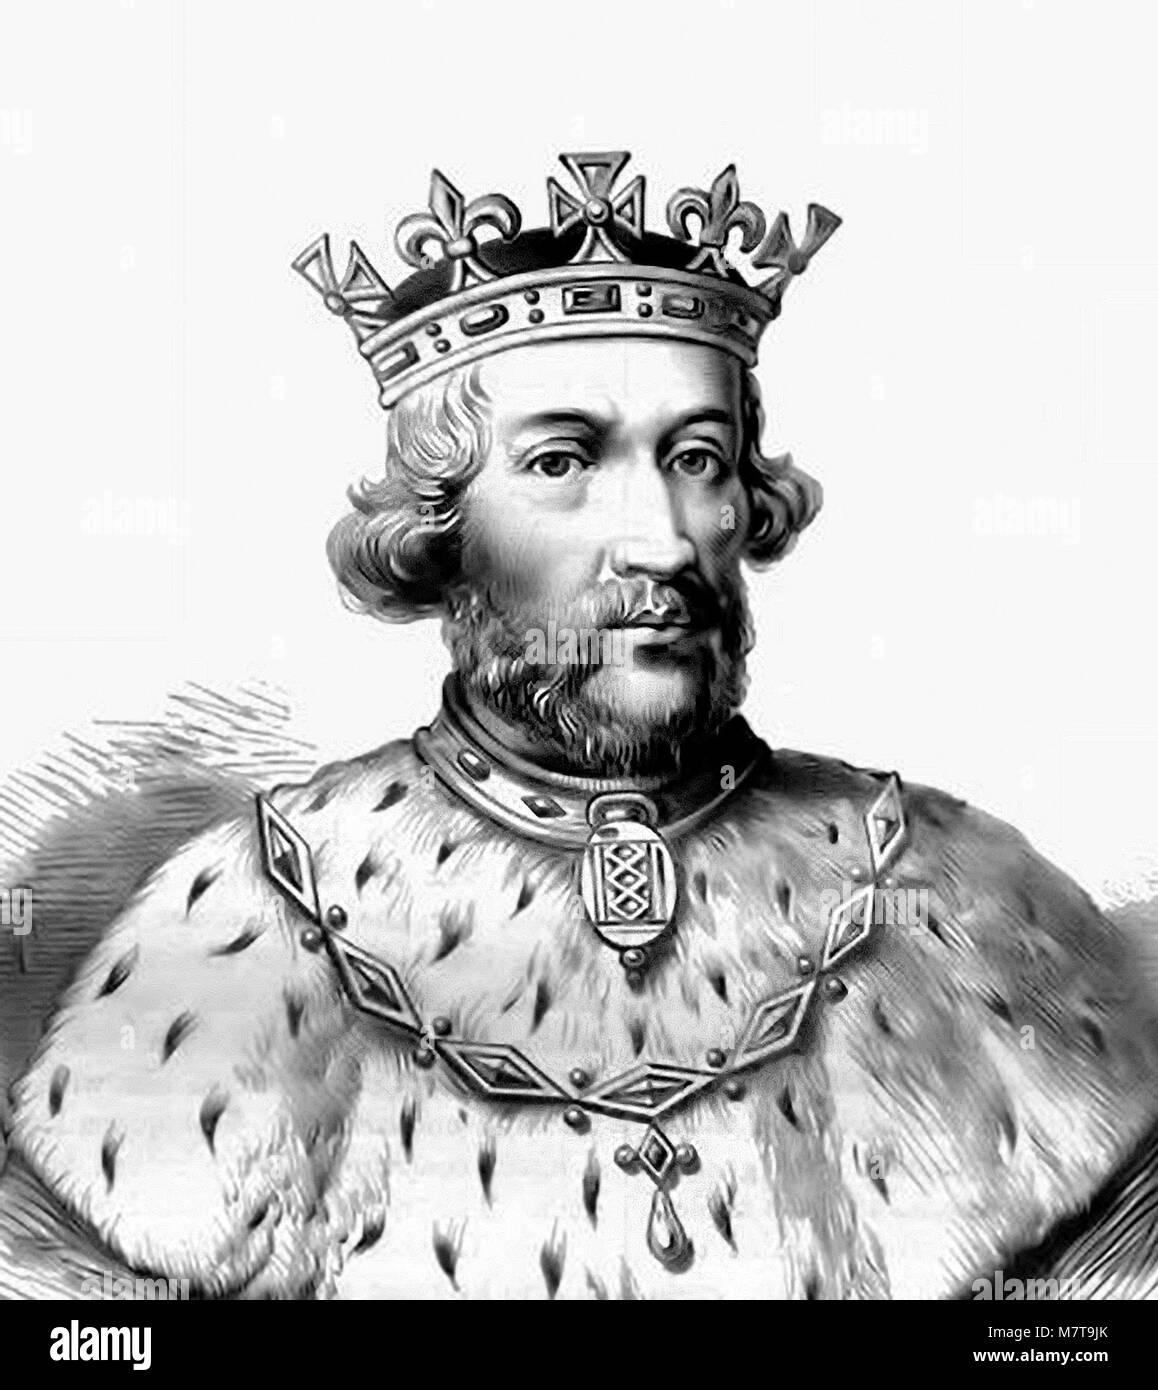 Edward II. Portrait of King Edward II of England (1284-1327). - Stock Image